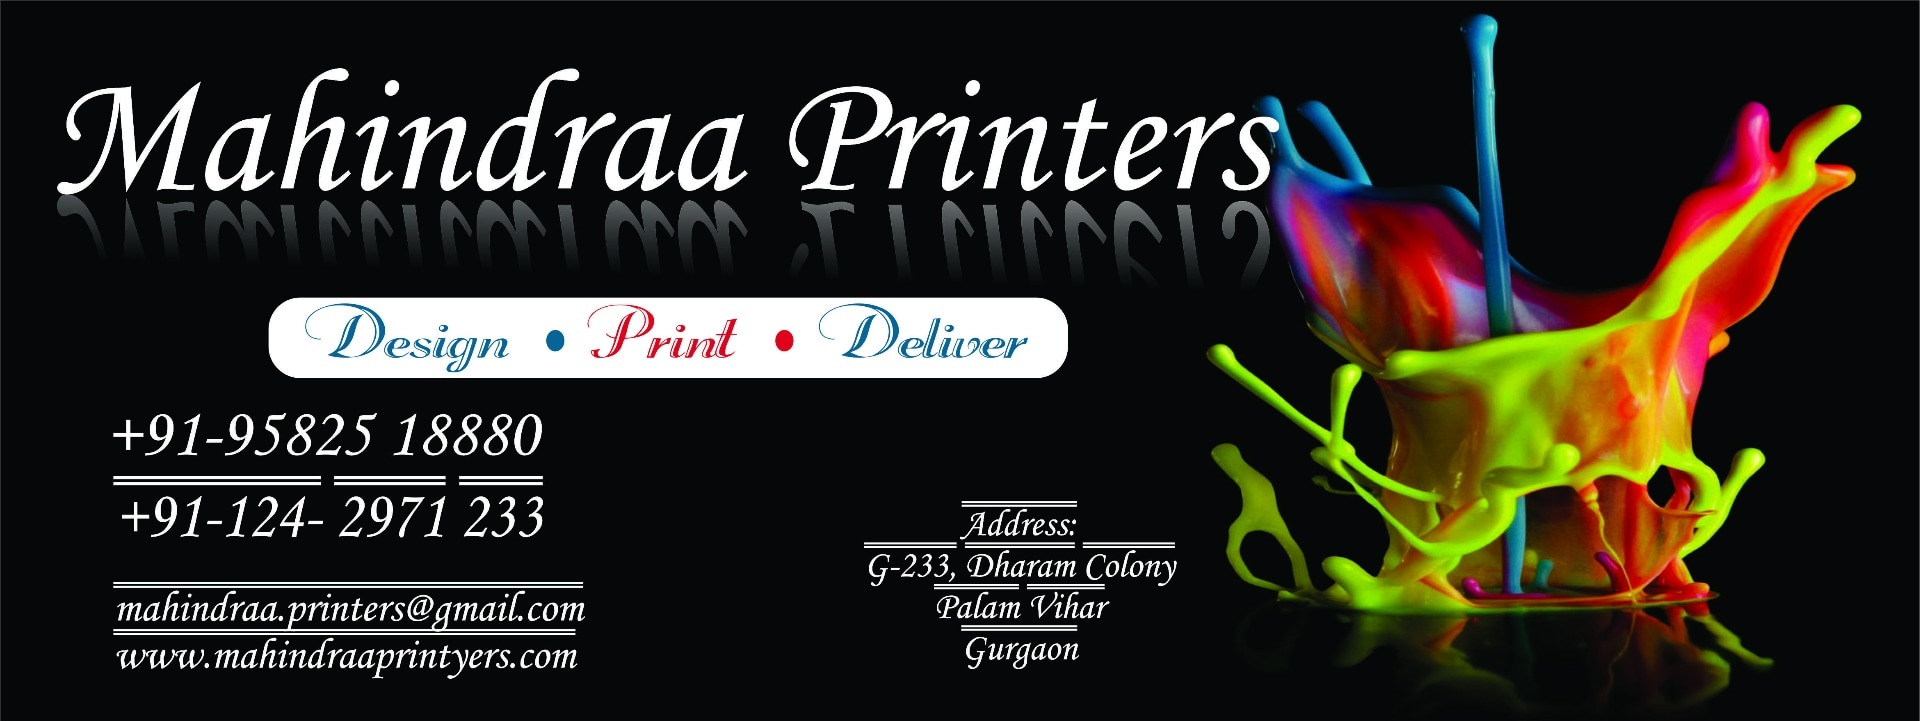 Mahindraa Printers - The Best Printing Service in Gurgaon & Delhi